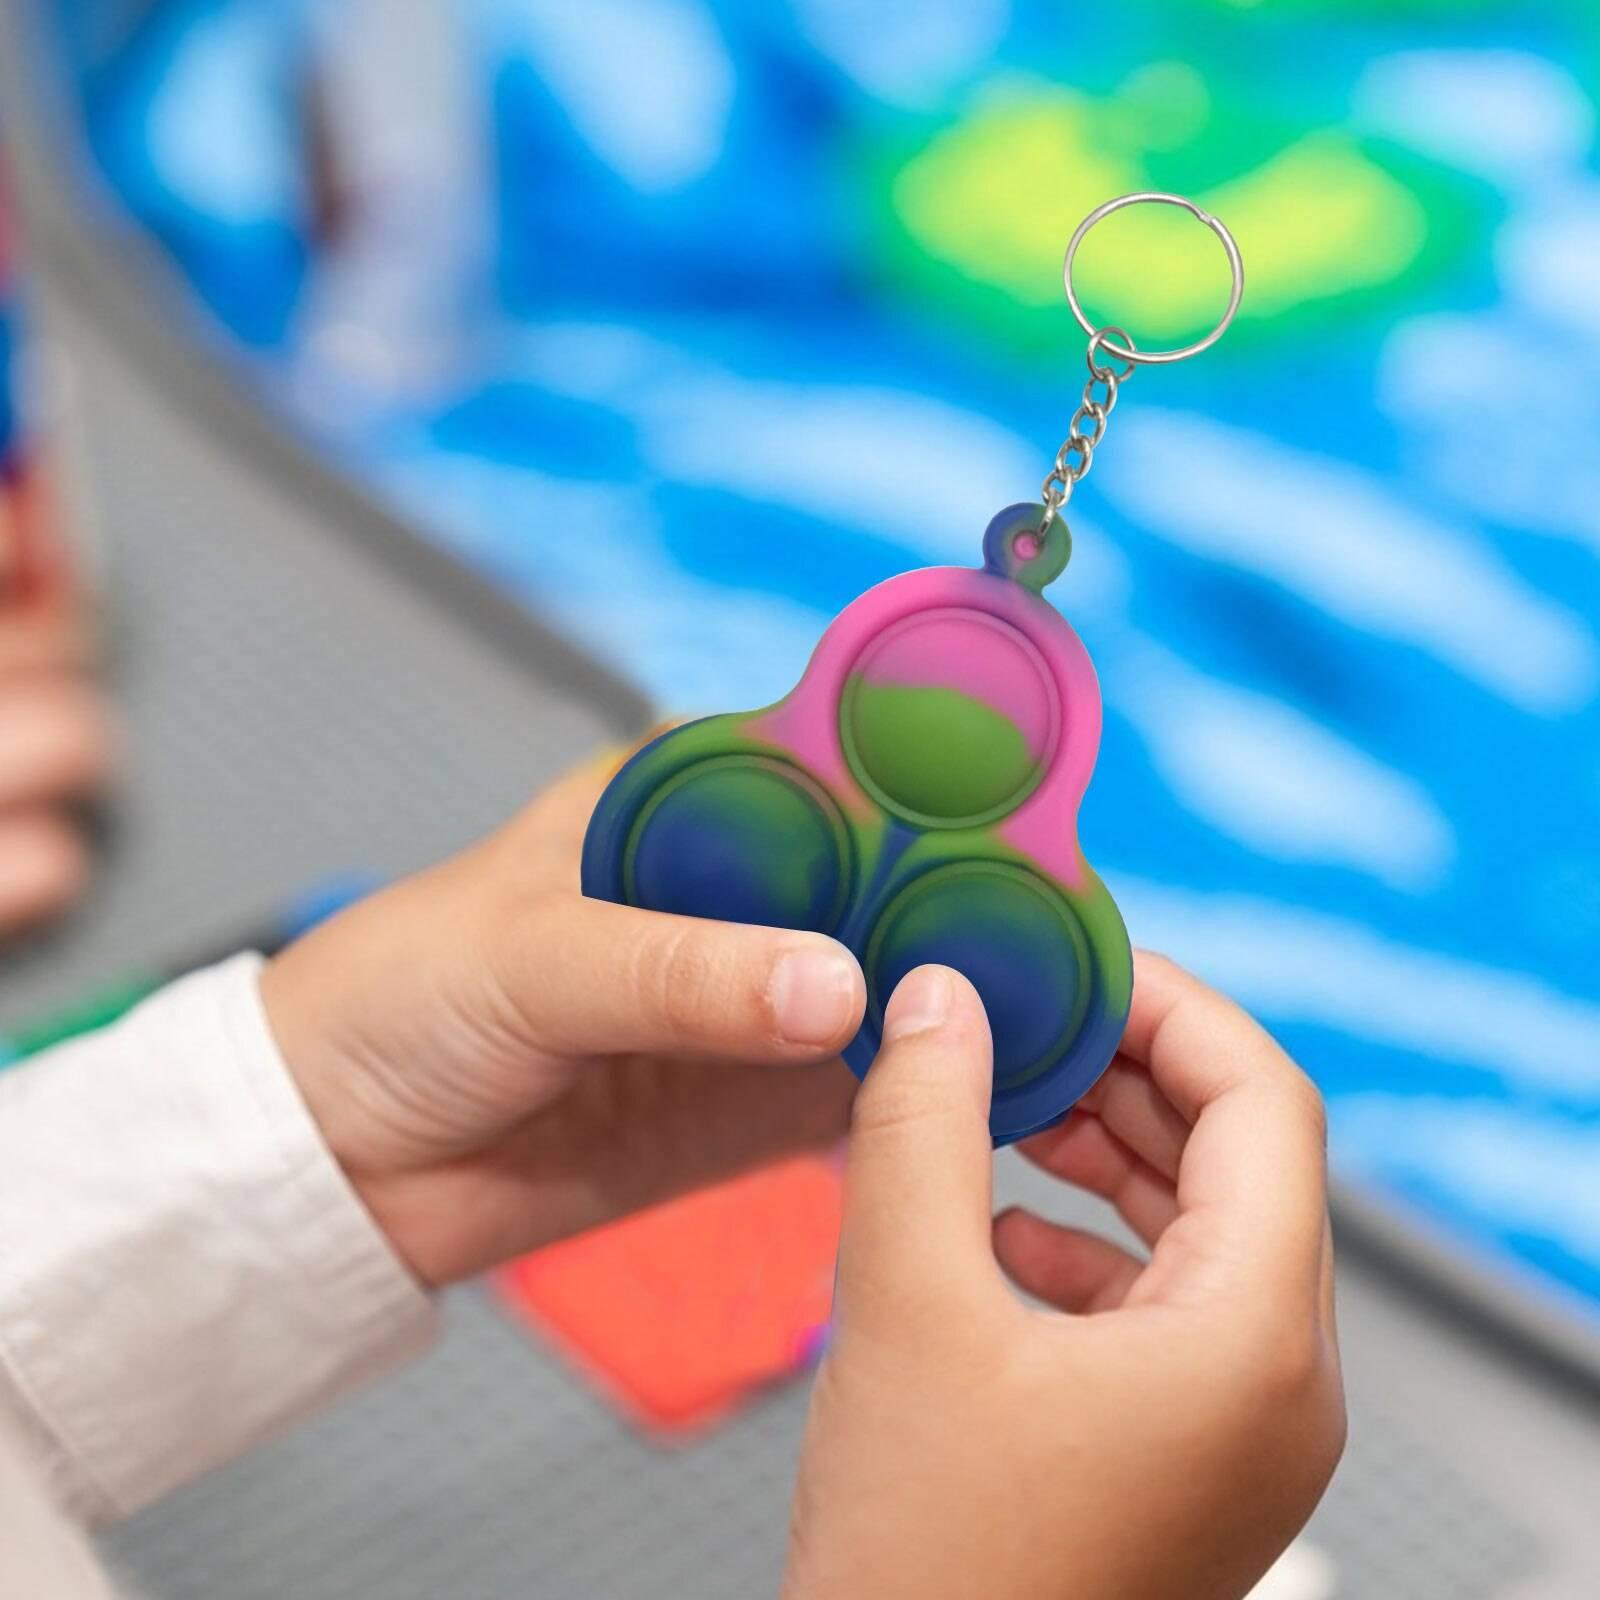 Simple Dimple Antistress Fidget Toy